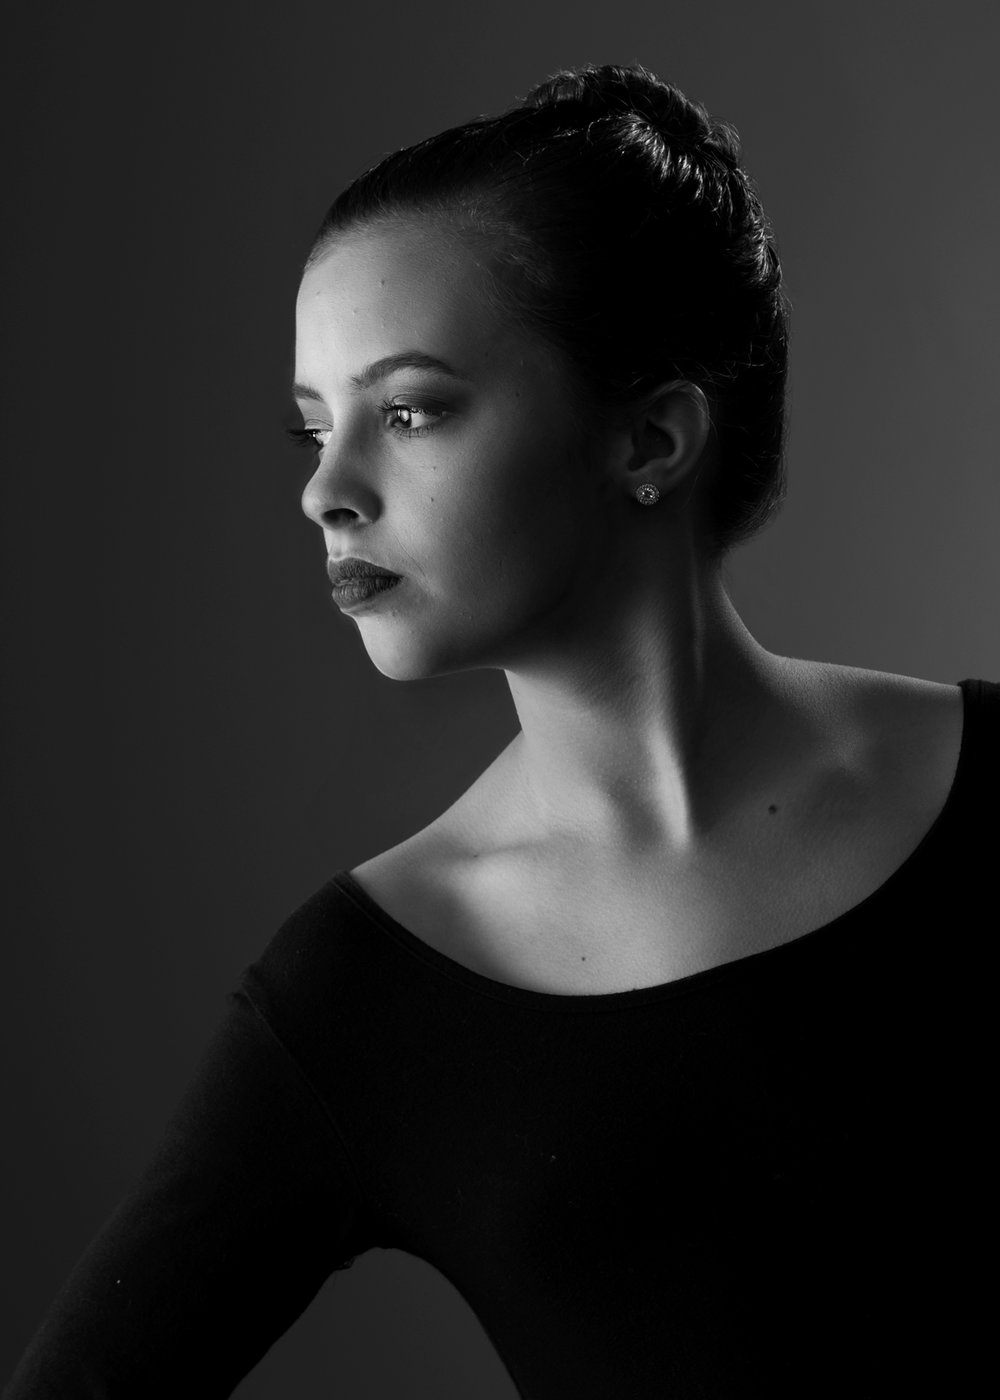 Isabelle Dauksch